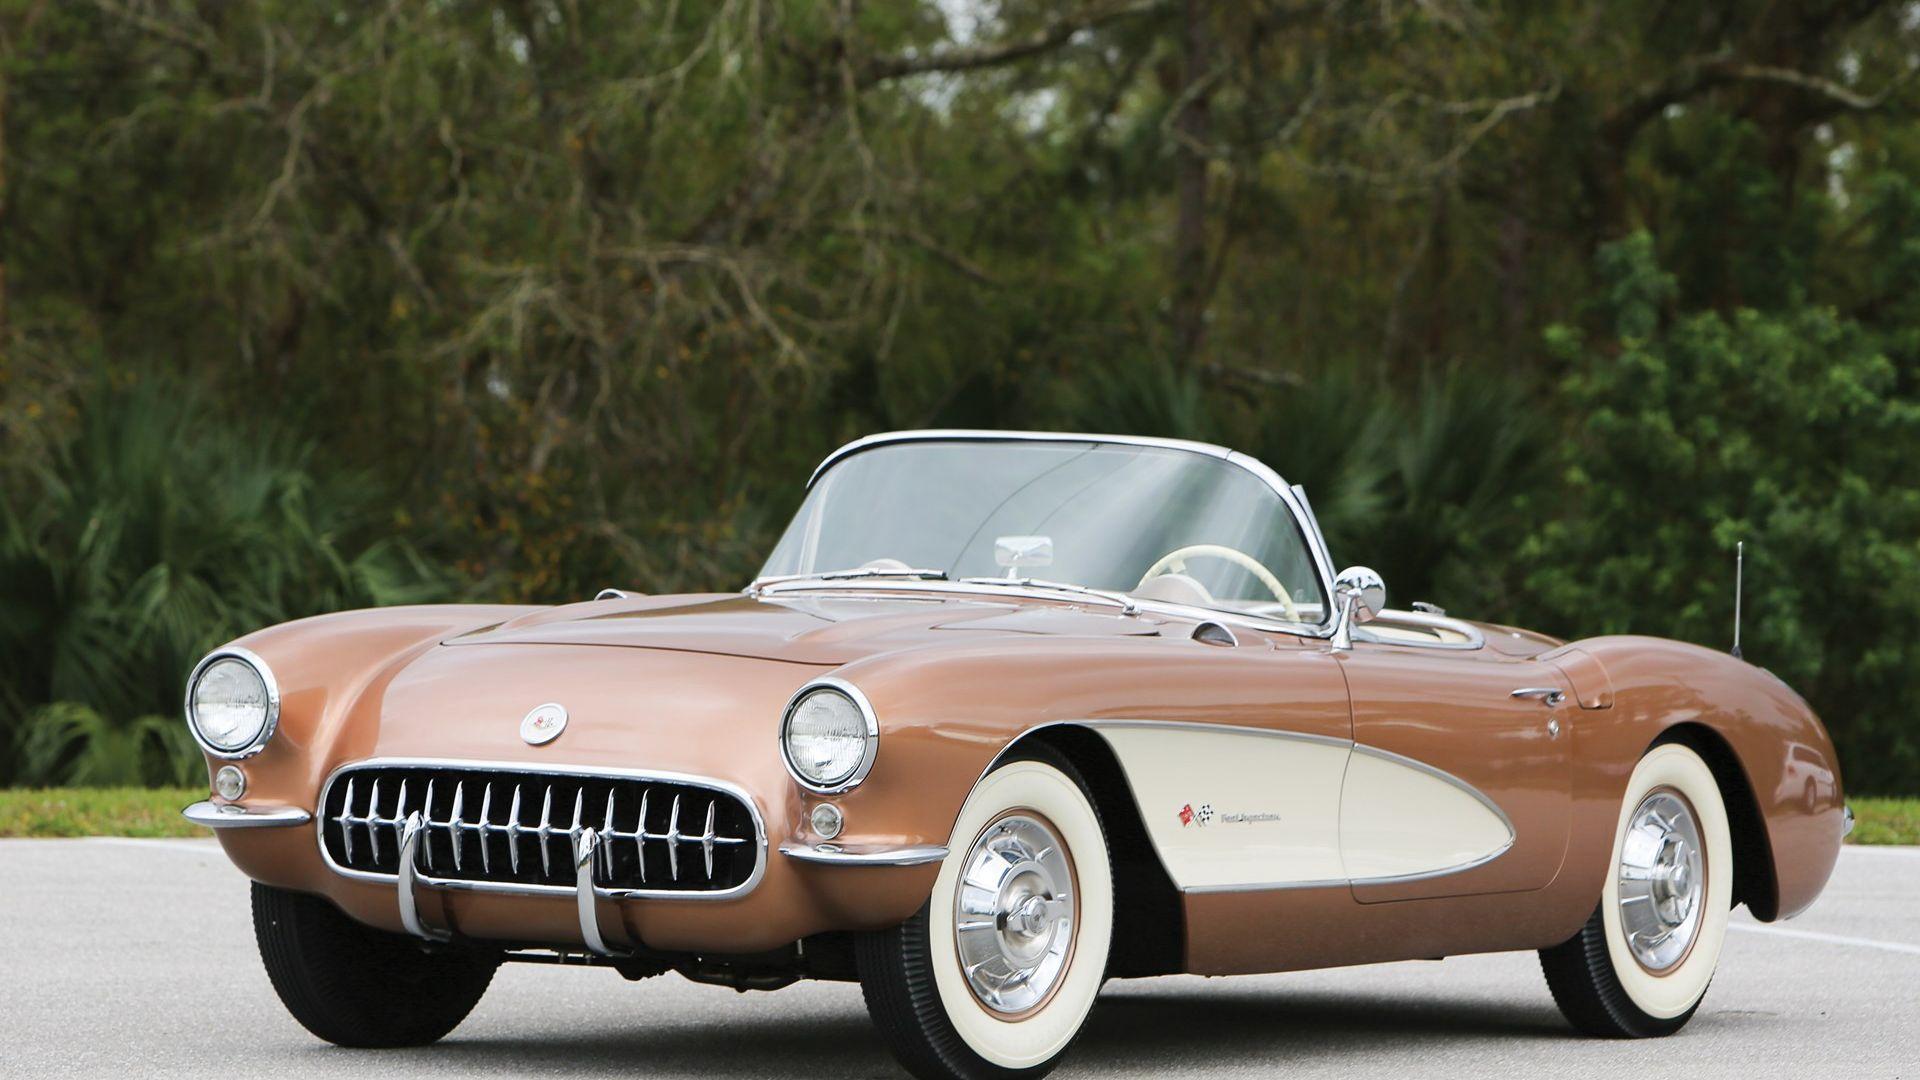 1957 Chevrolet Corvette 'Fuel-Injected'